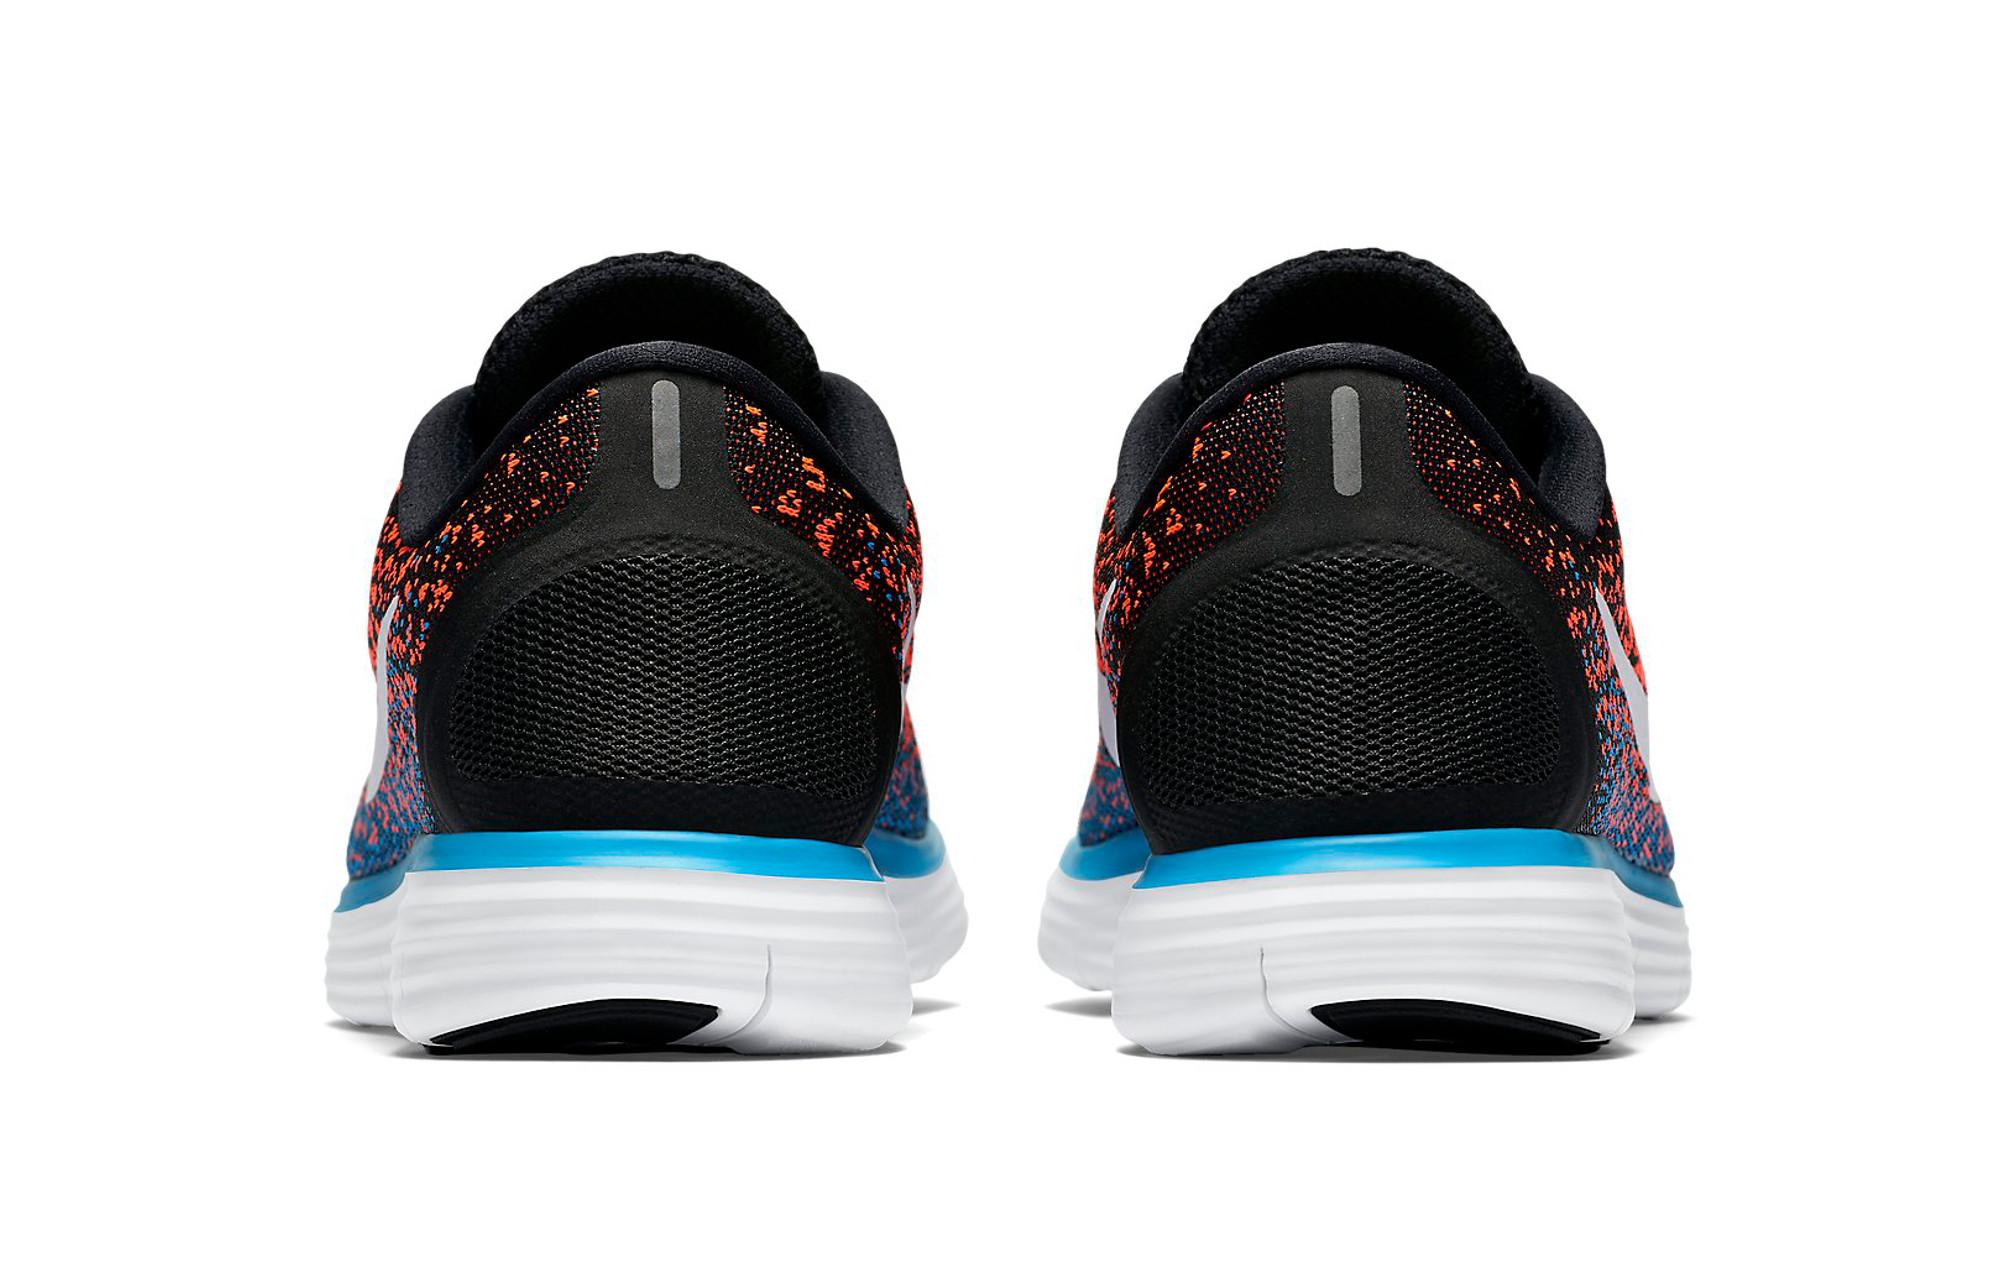 separation shoes faca5 35596 Chaussures de Running Nike FREE RUN DISTANCE Noir   Orange